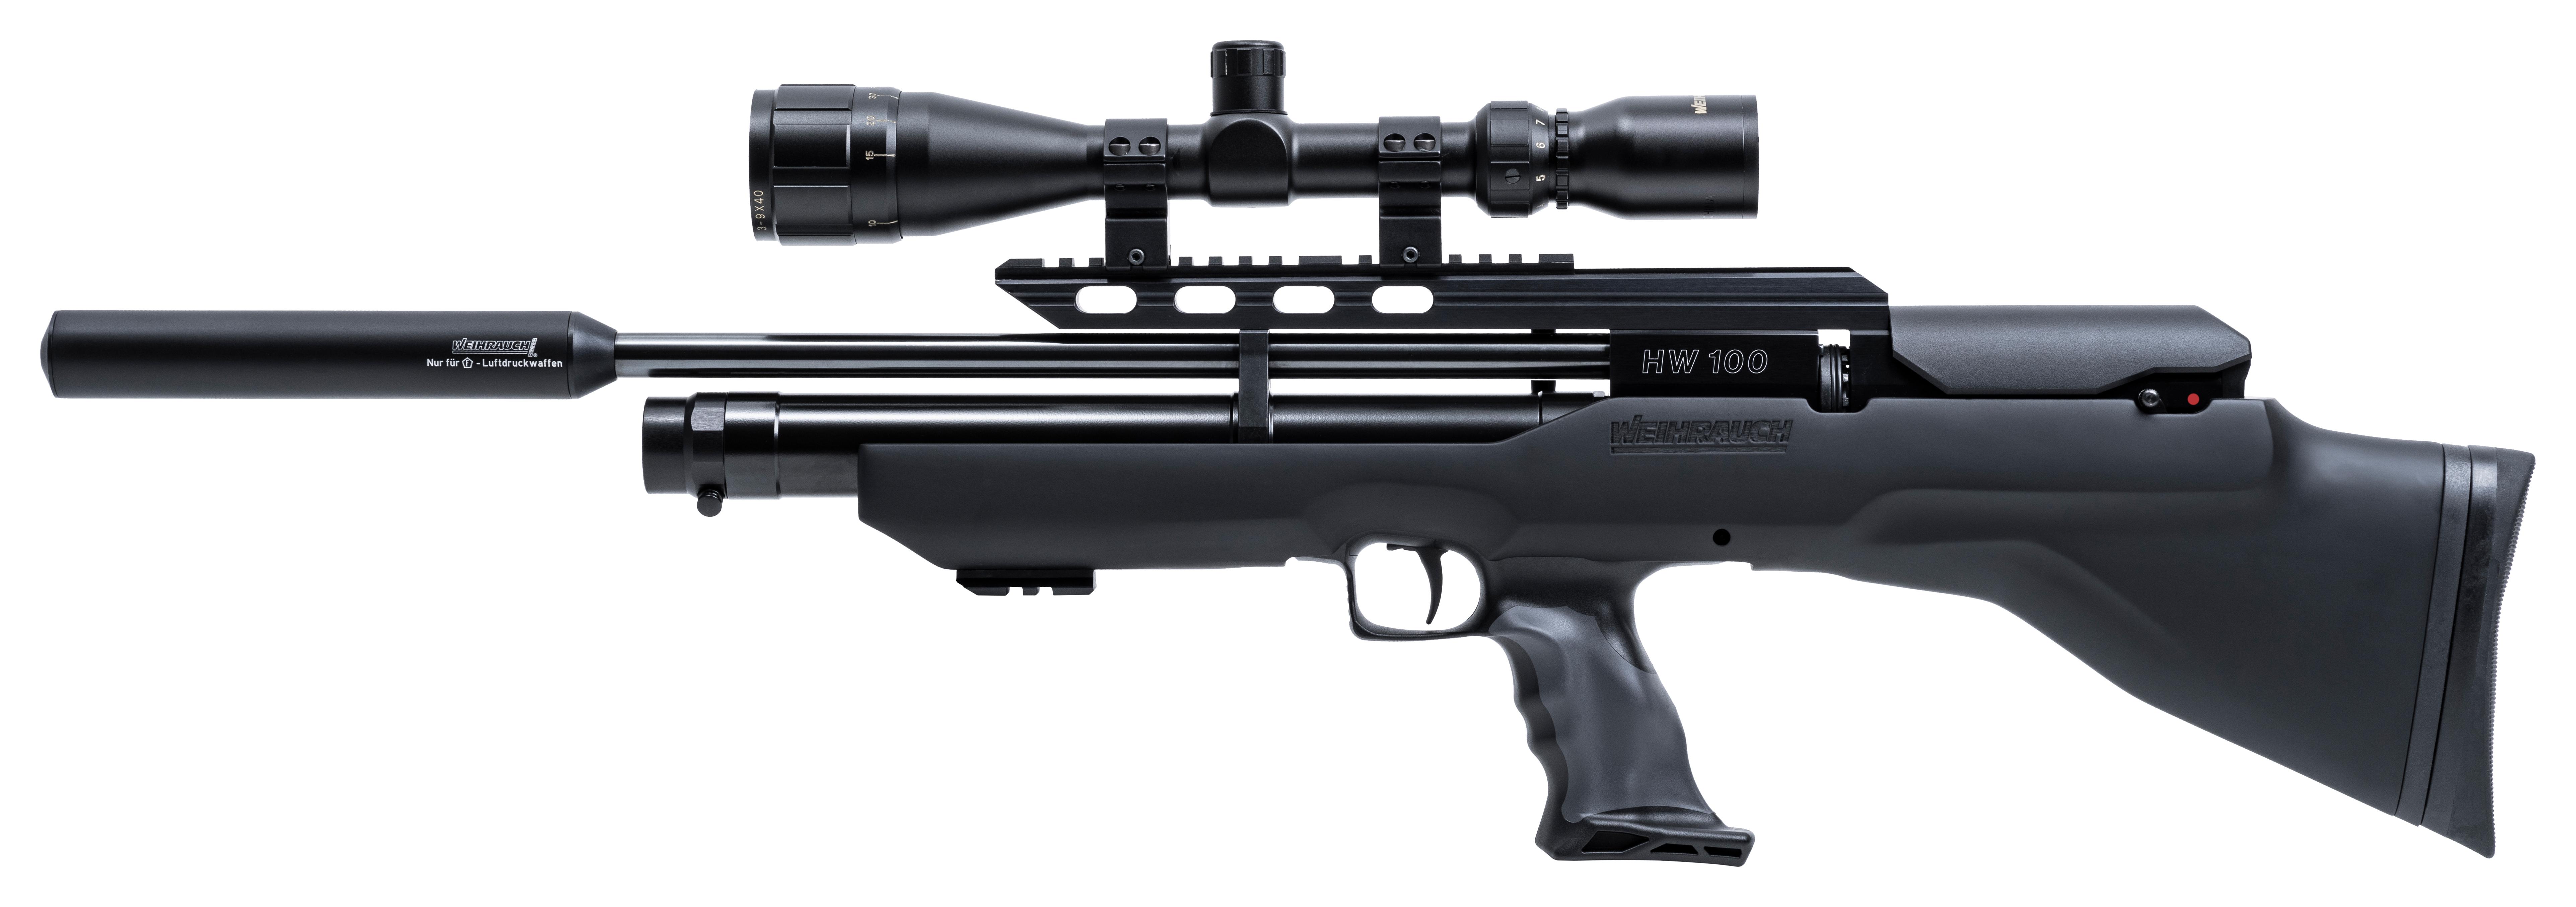 Weihrauch HW100 Bullpup Black/Grey Synthetic Air Rifle ...